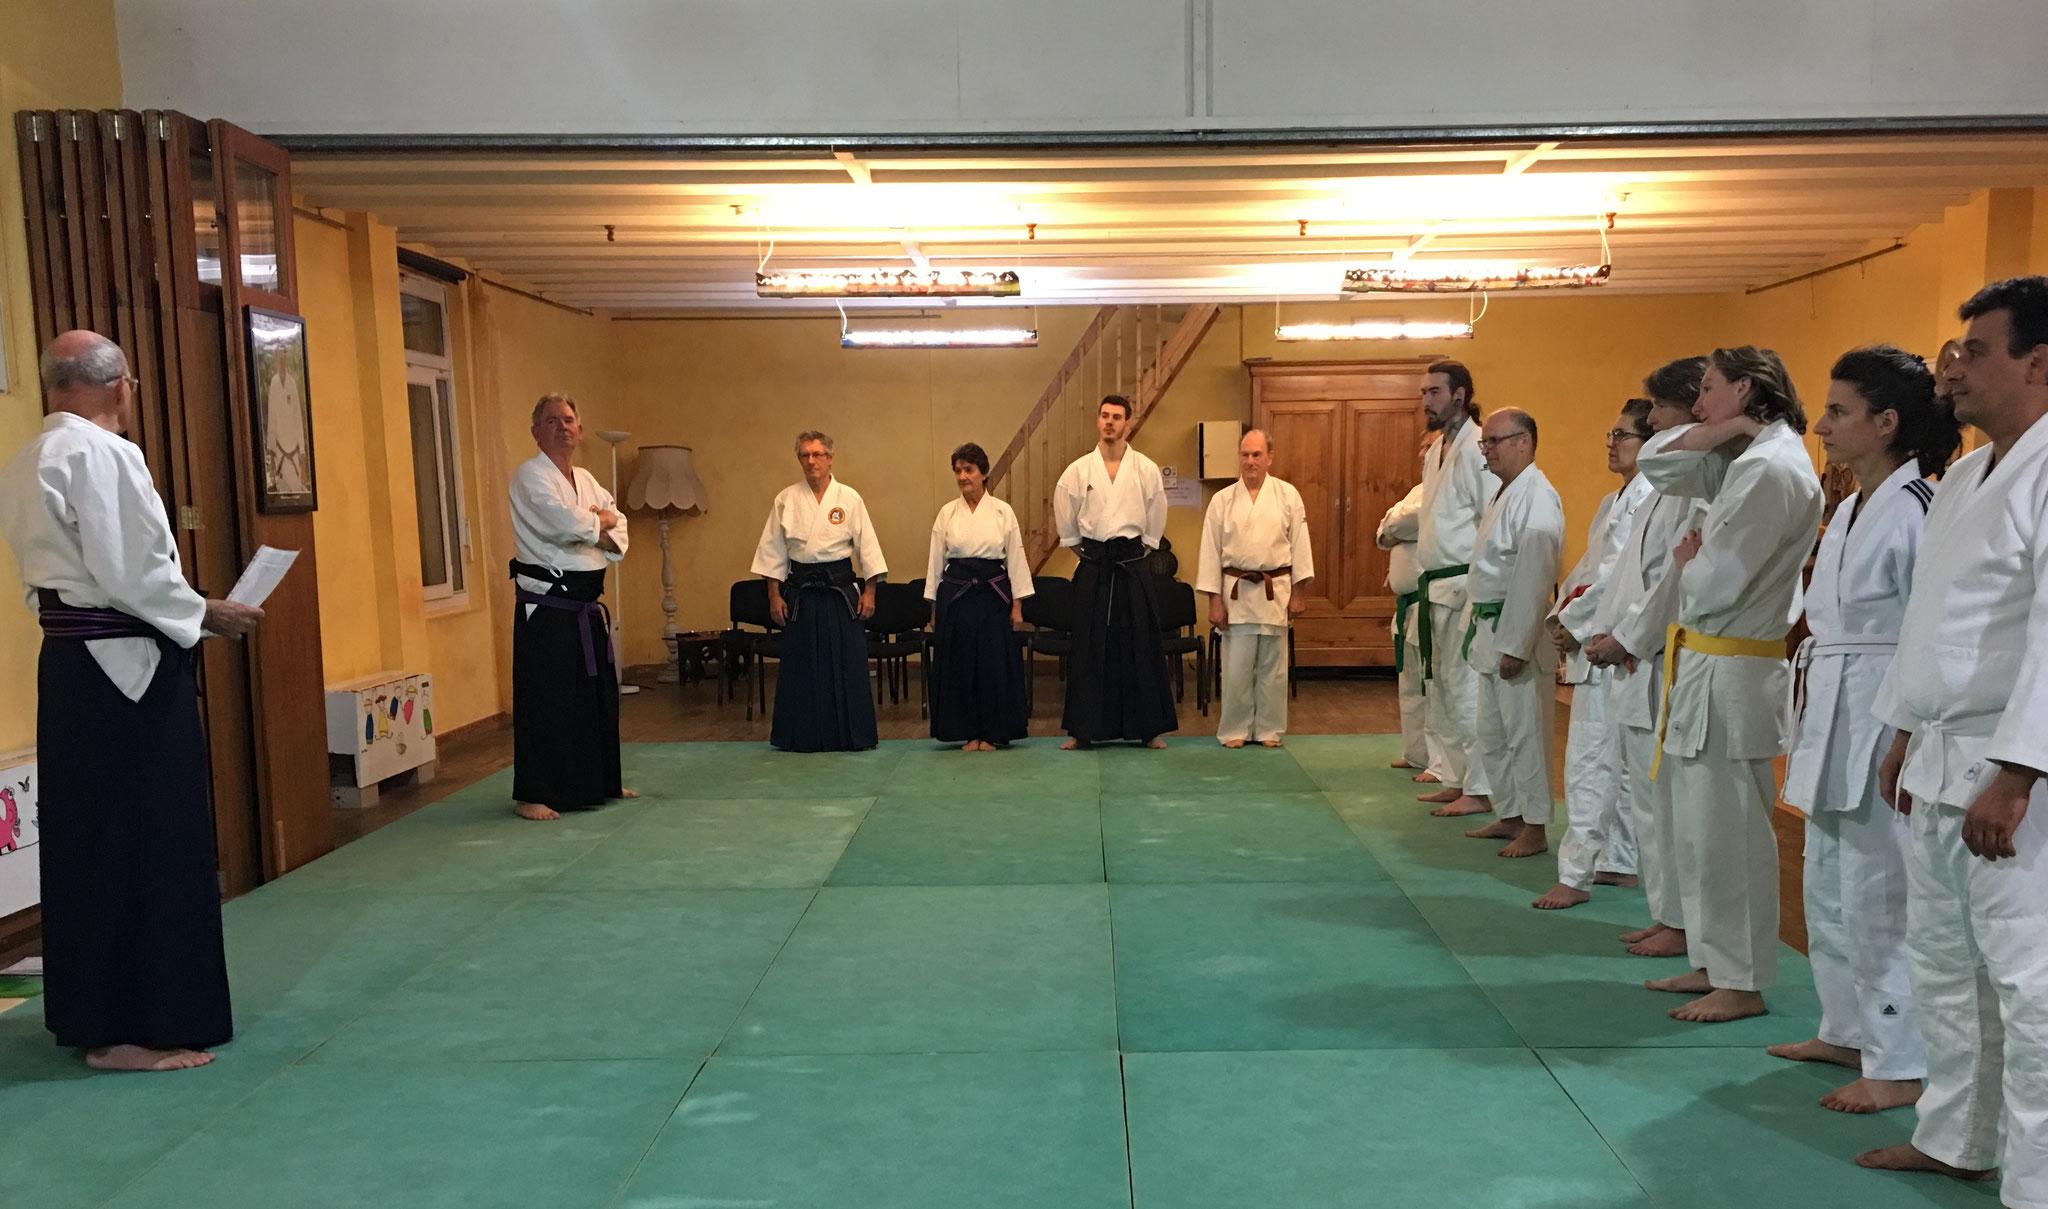 Respecter la tradition ( Rei Shiki 礼式)